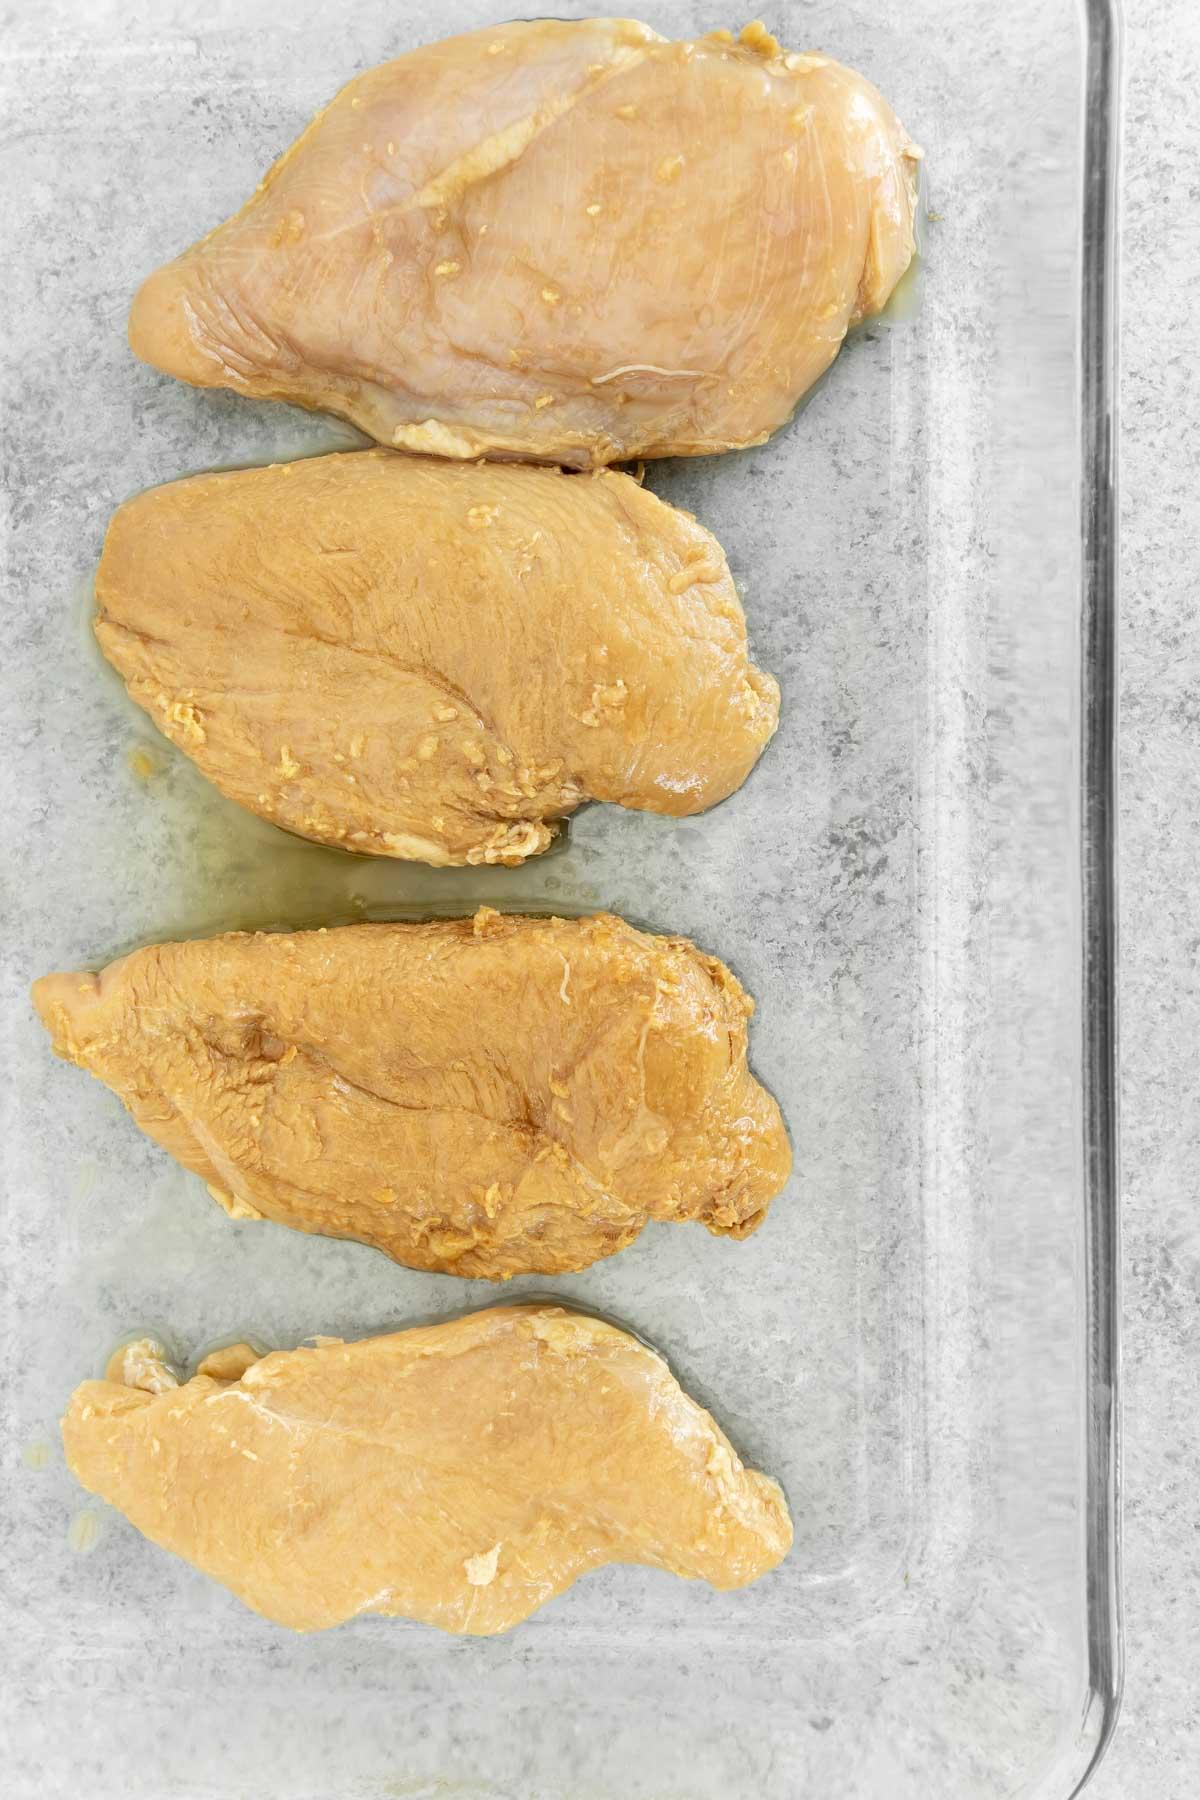 Chicken marinating for teriyaki chicken stir fry